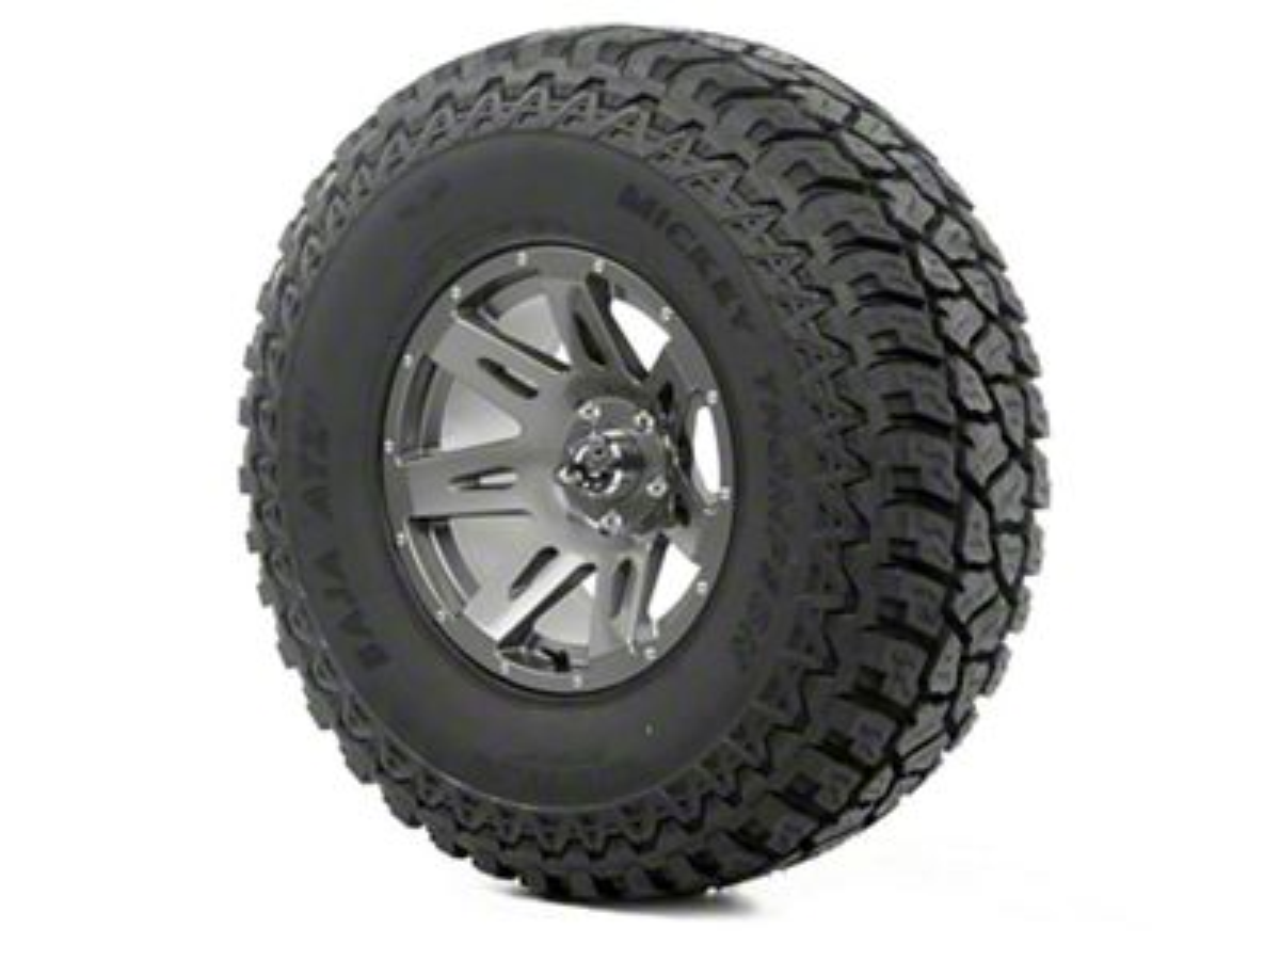 Rugged Ridge XHD Wheel 17x9 Gun Metal and Mickey Thompson ATZ P3 37x12.50x17 Tire (07-18 Jeep Wrangler JK)